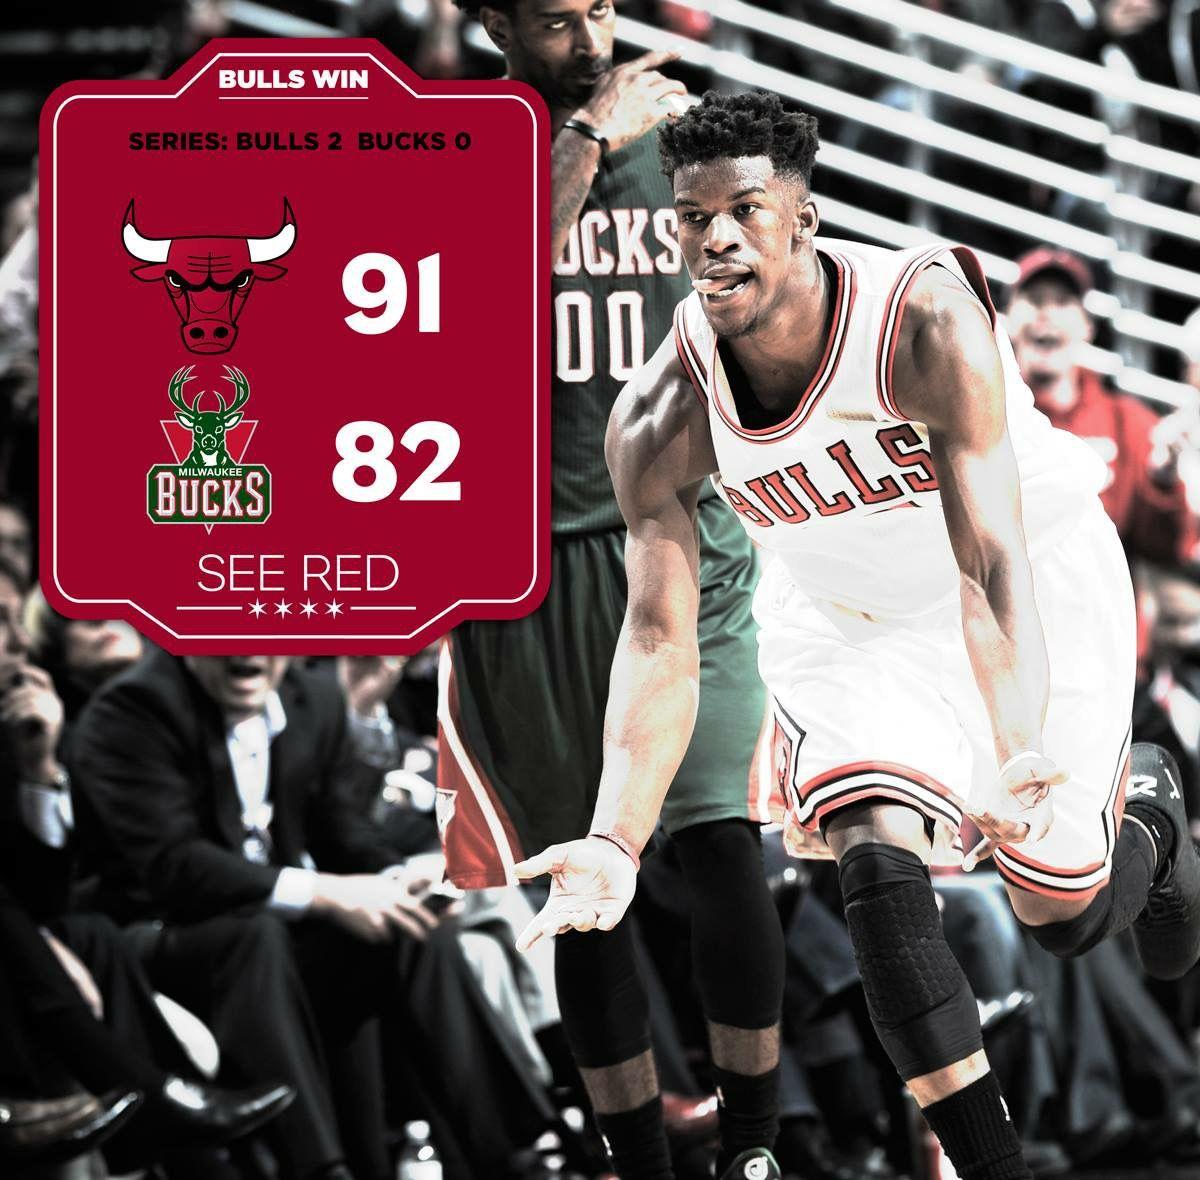 Playoffs 2014 2015 First Round Game 2 Monday April 20 2015 Series 2 0 Chicago Sports Teams Chicago Sports Da Bulls